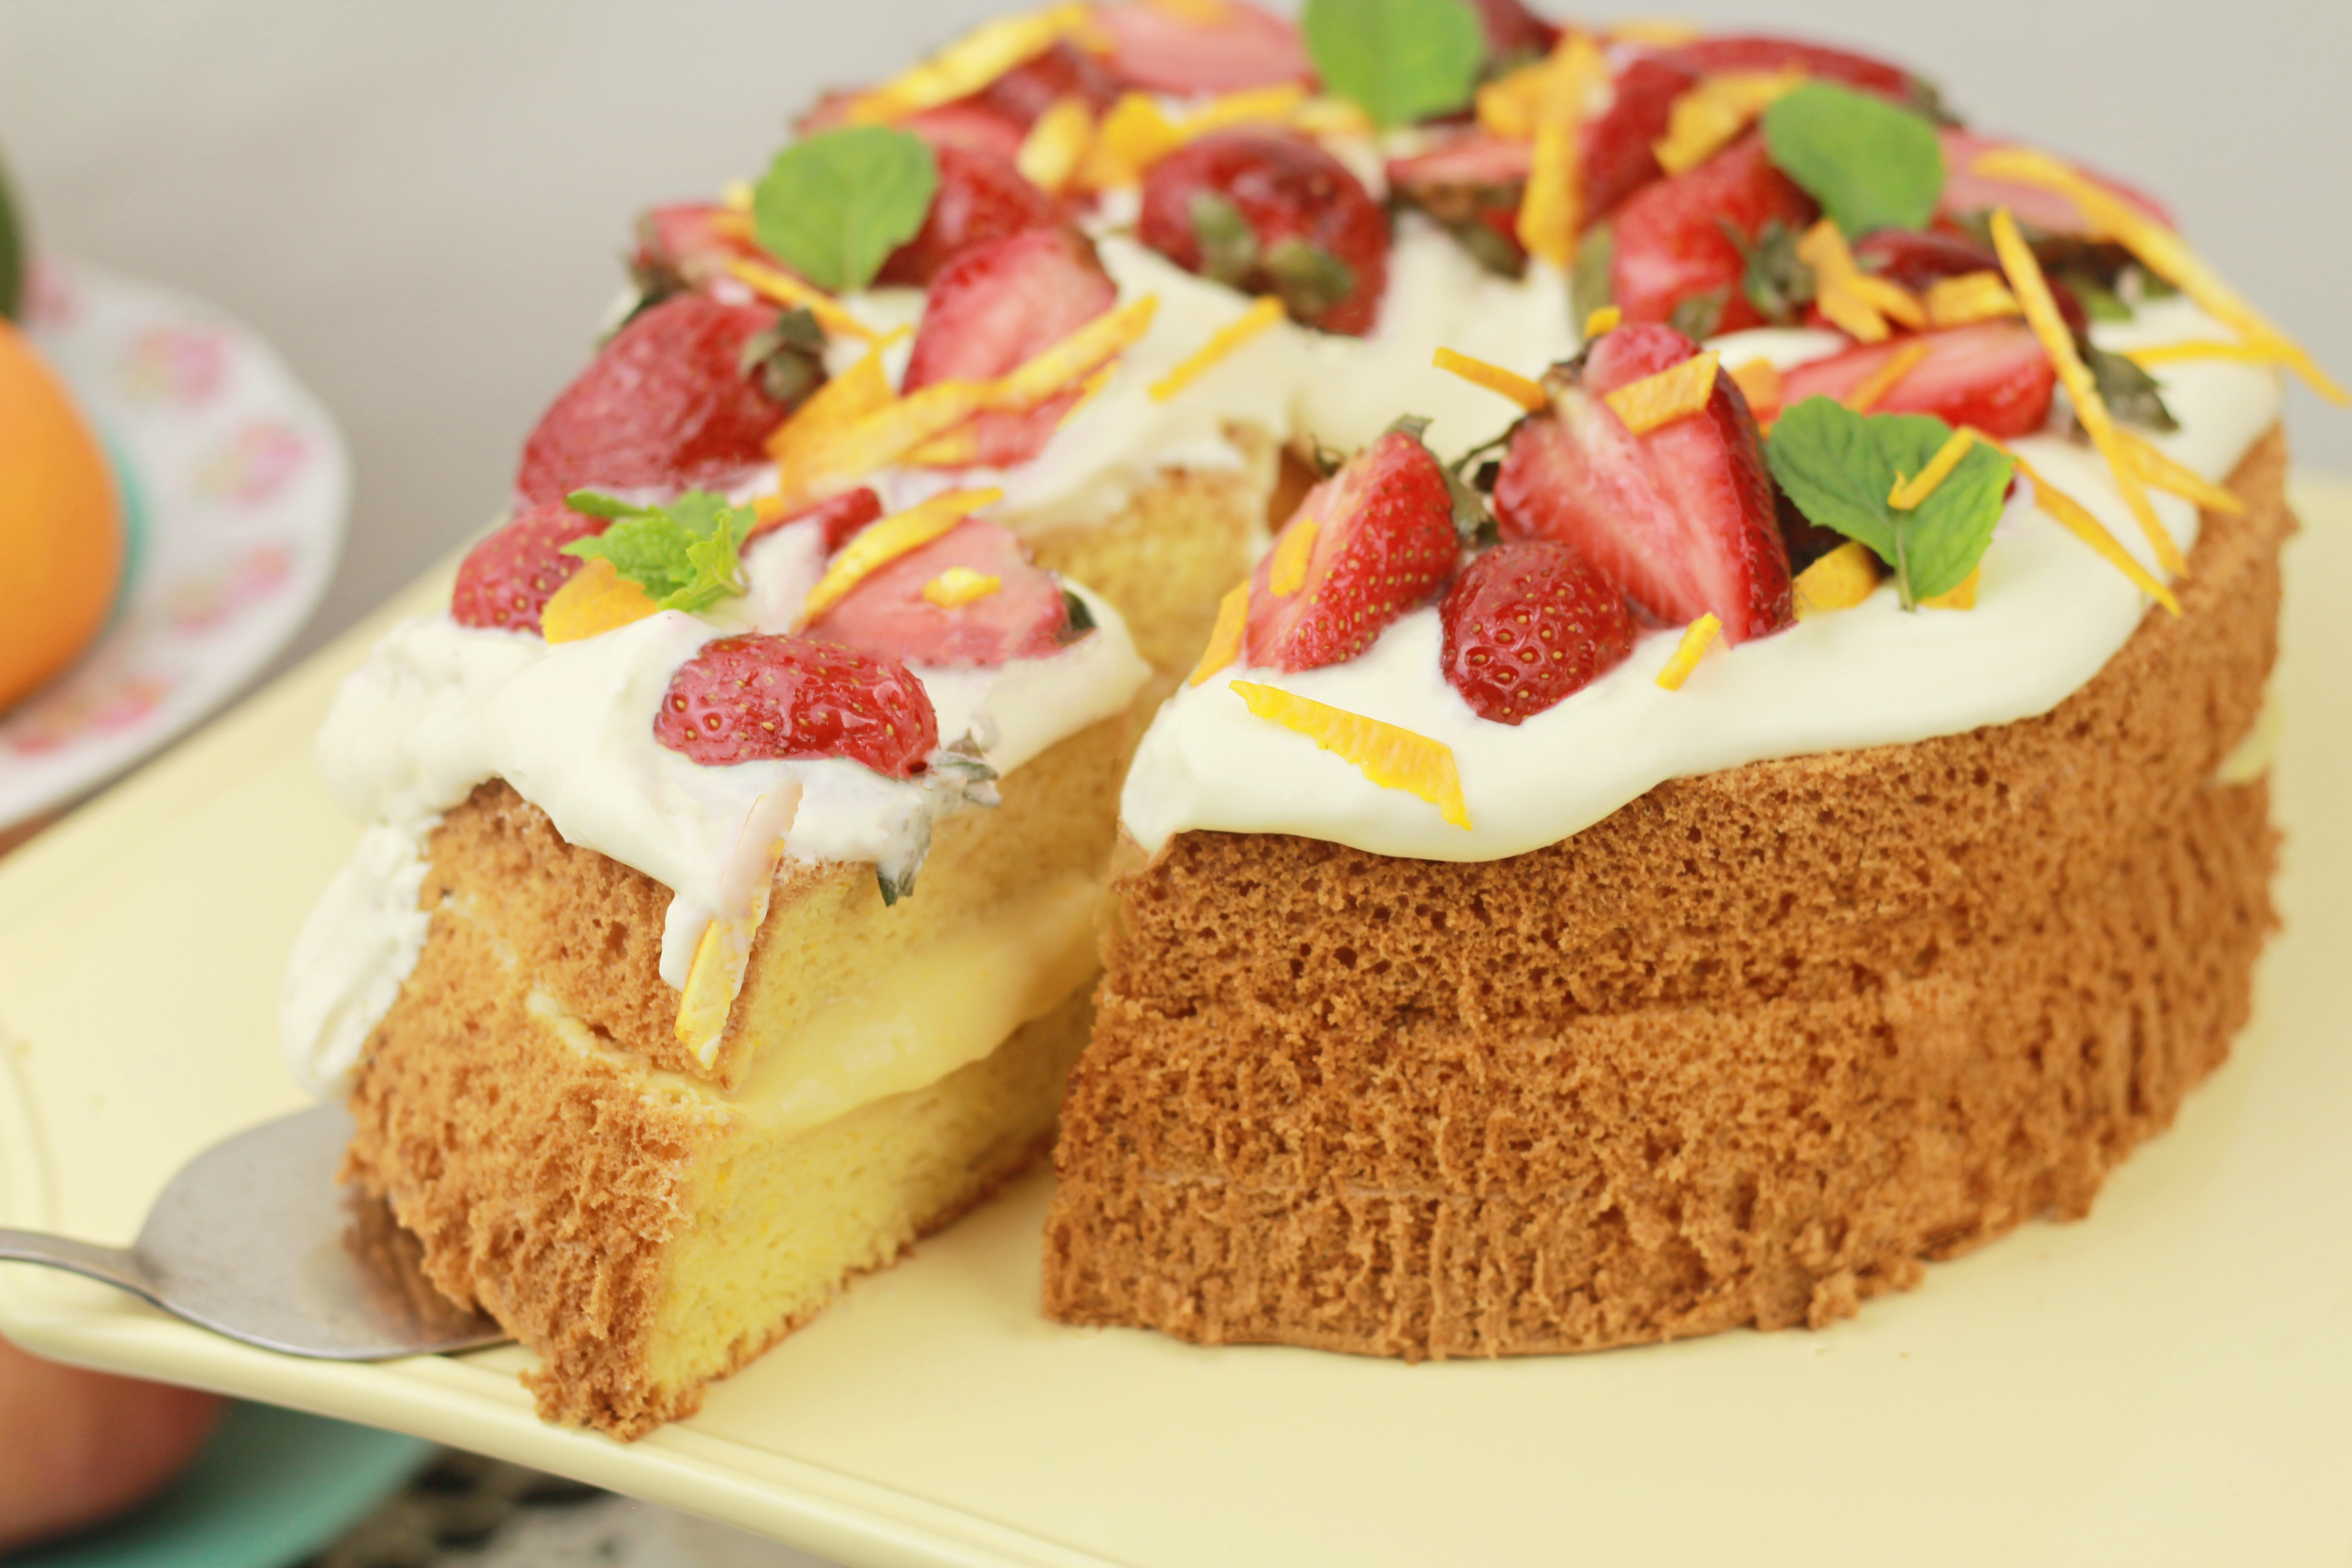 Orange Chiffon Cake With Orange Custard And Whipped Cream